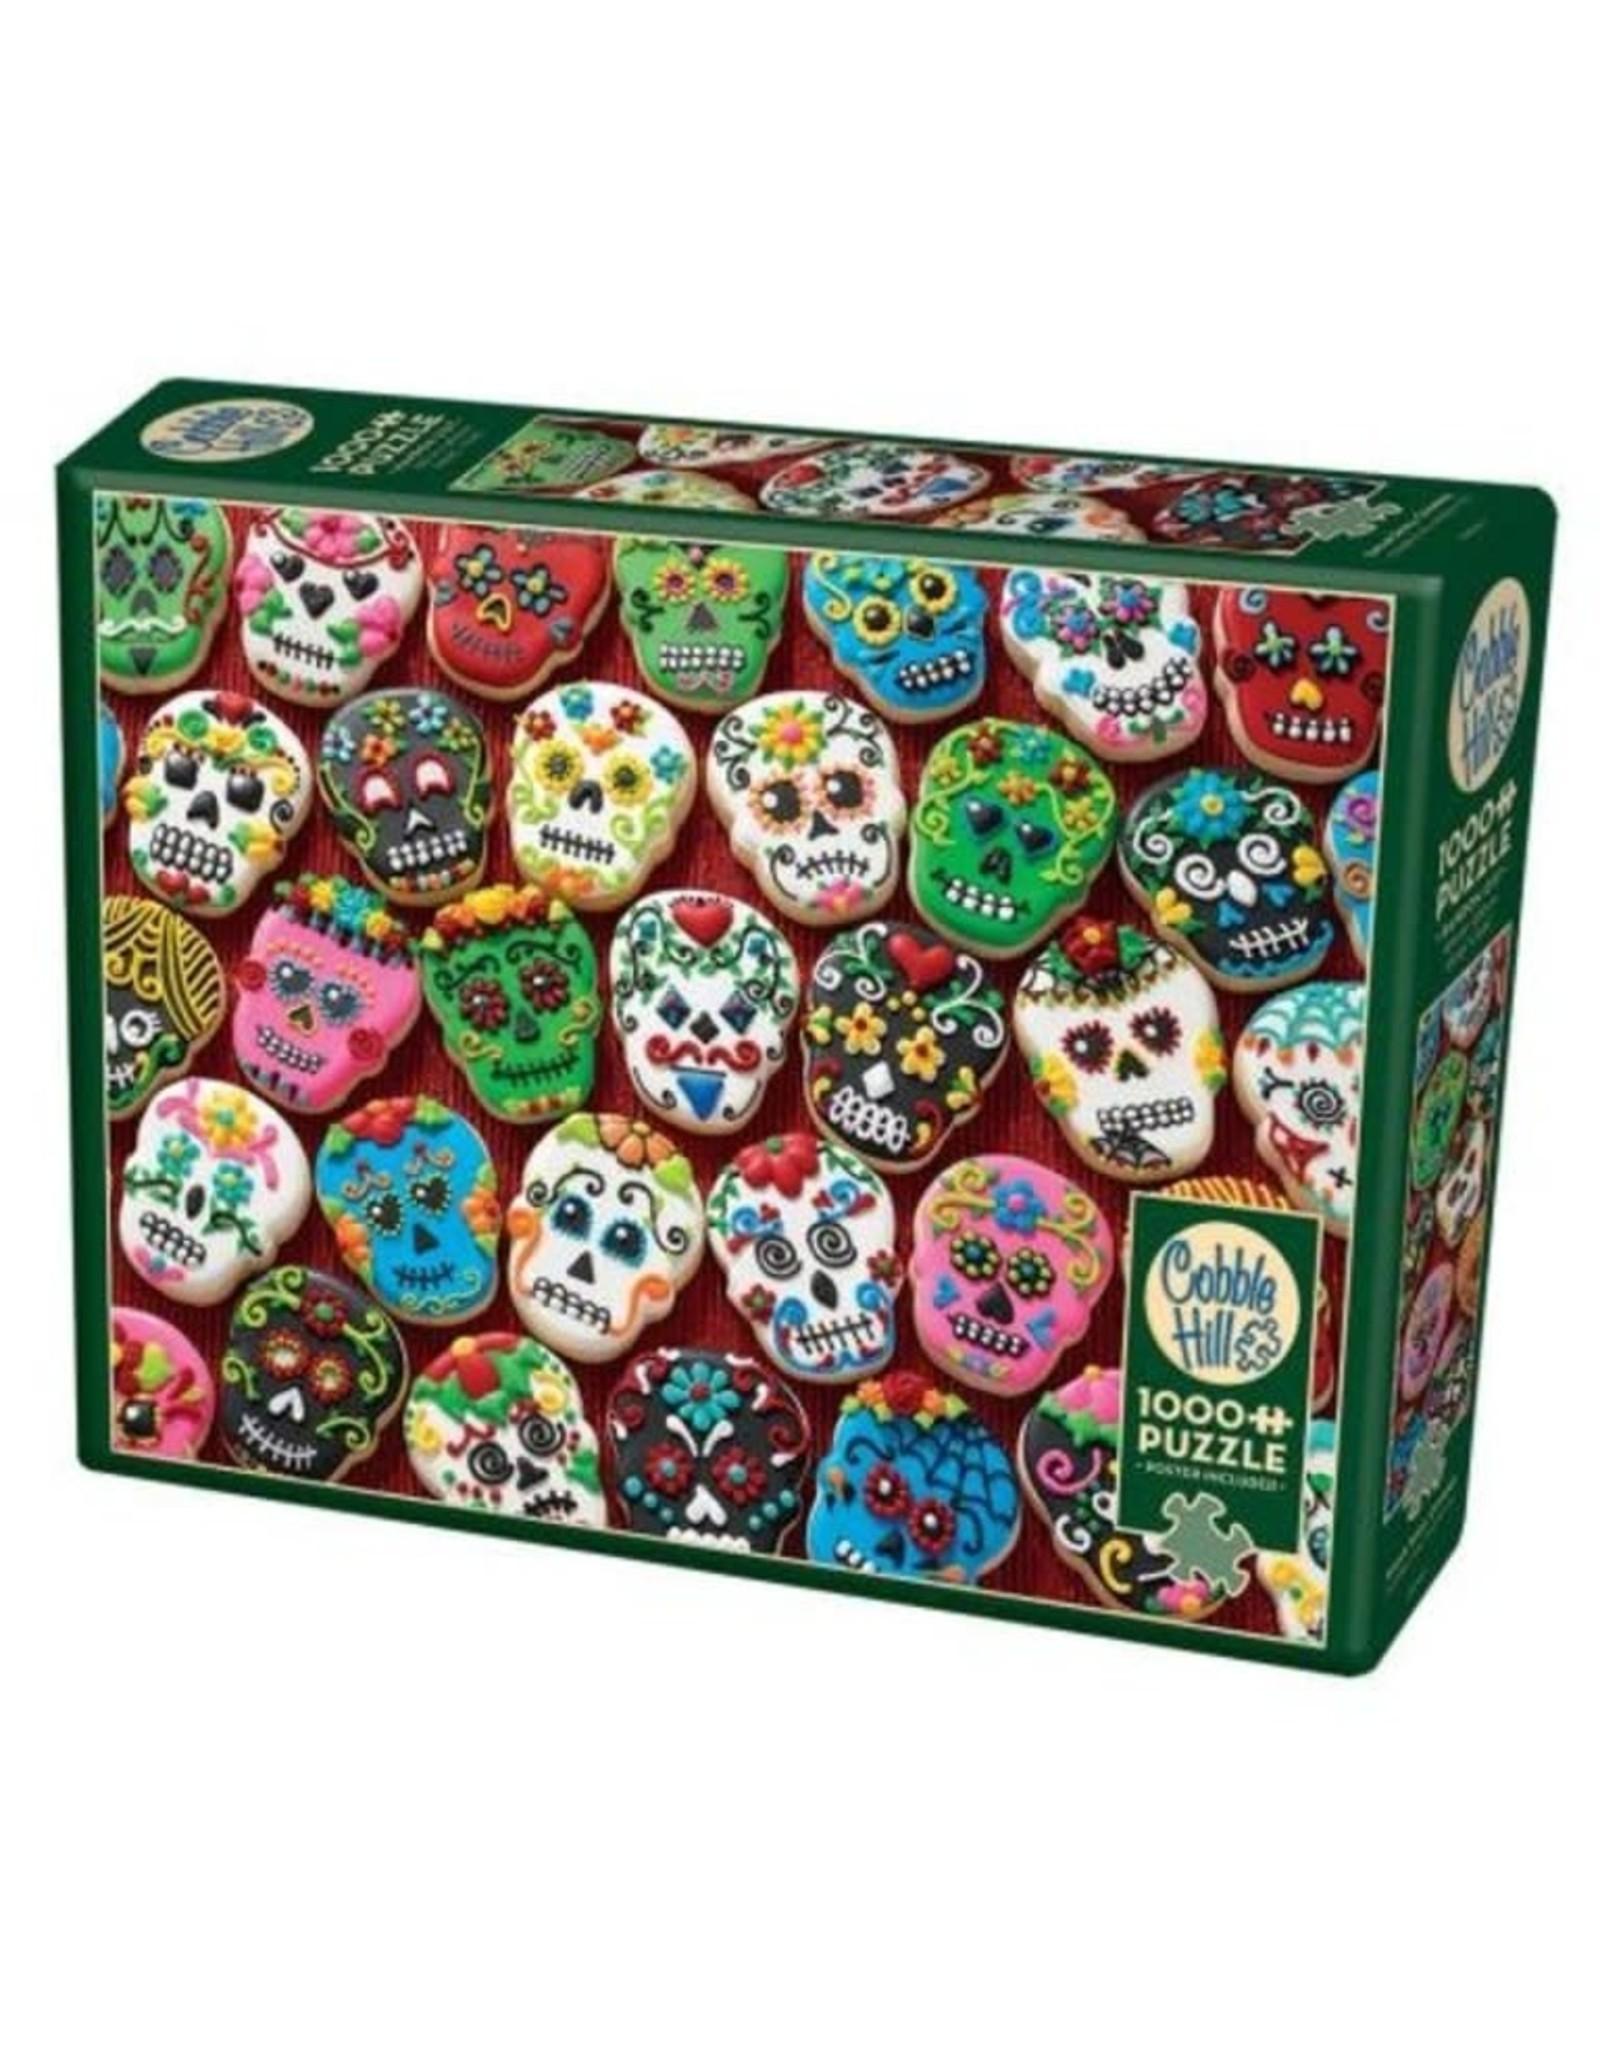 Cobble Hill Sugar Skull Cookies 1000 PC